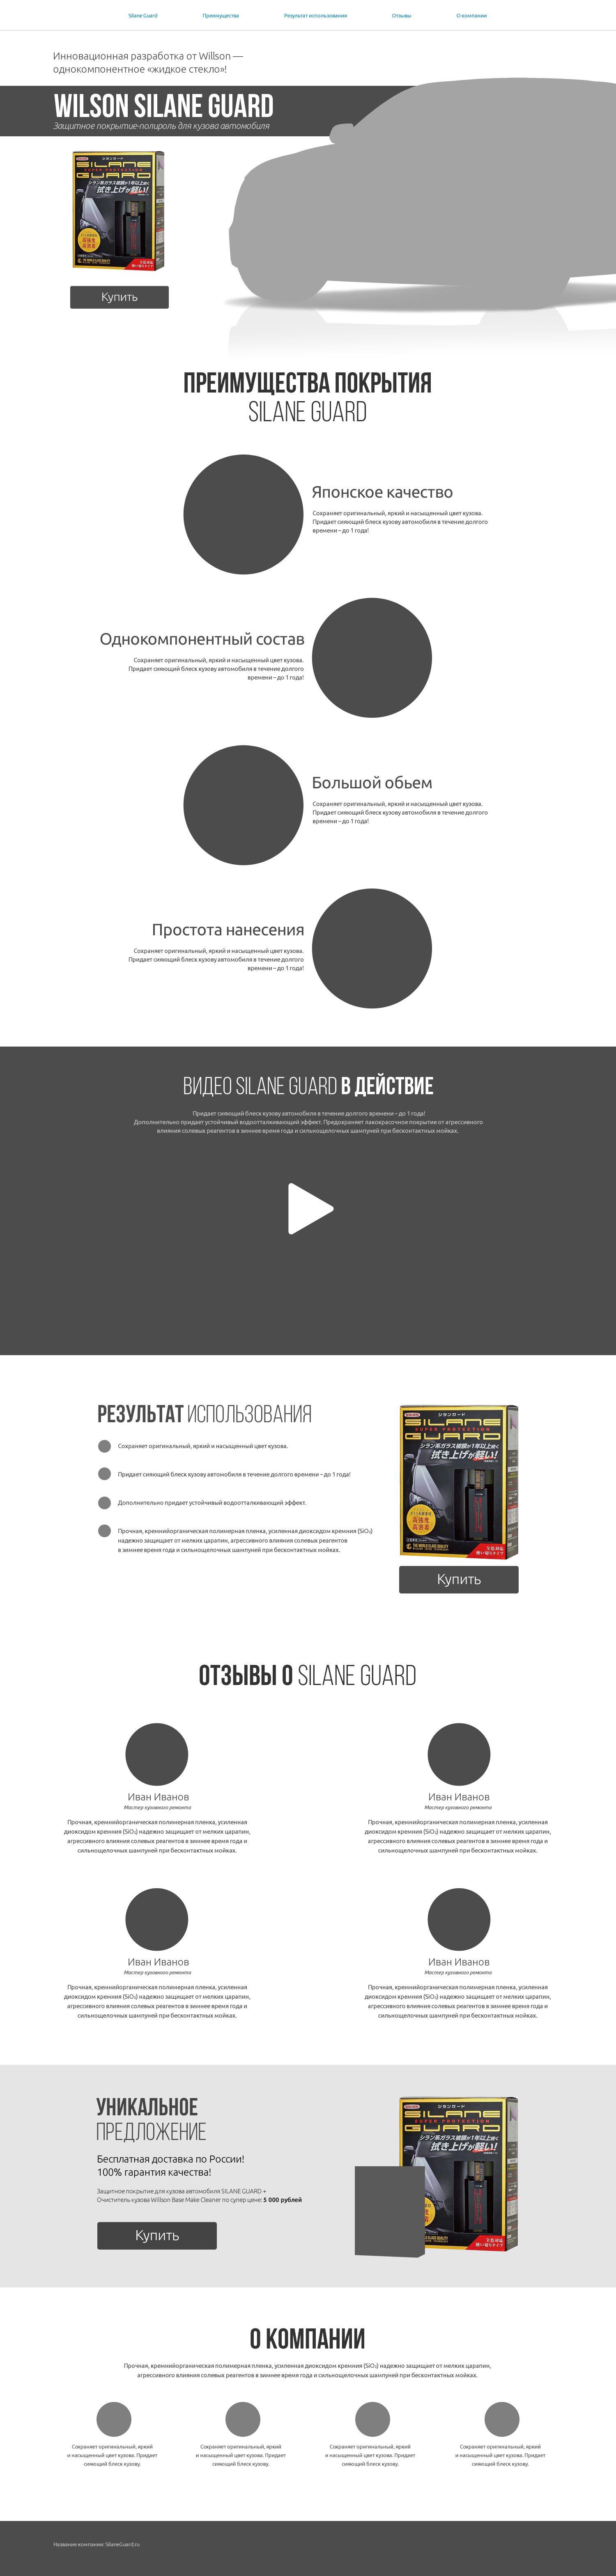 Landing page для silaneguard.ru - дизайнер Sidius